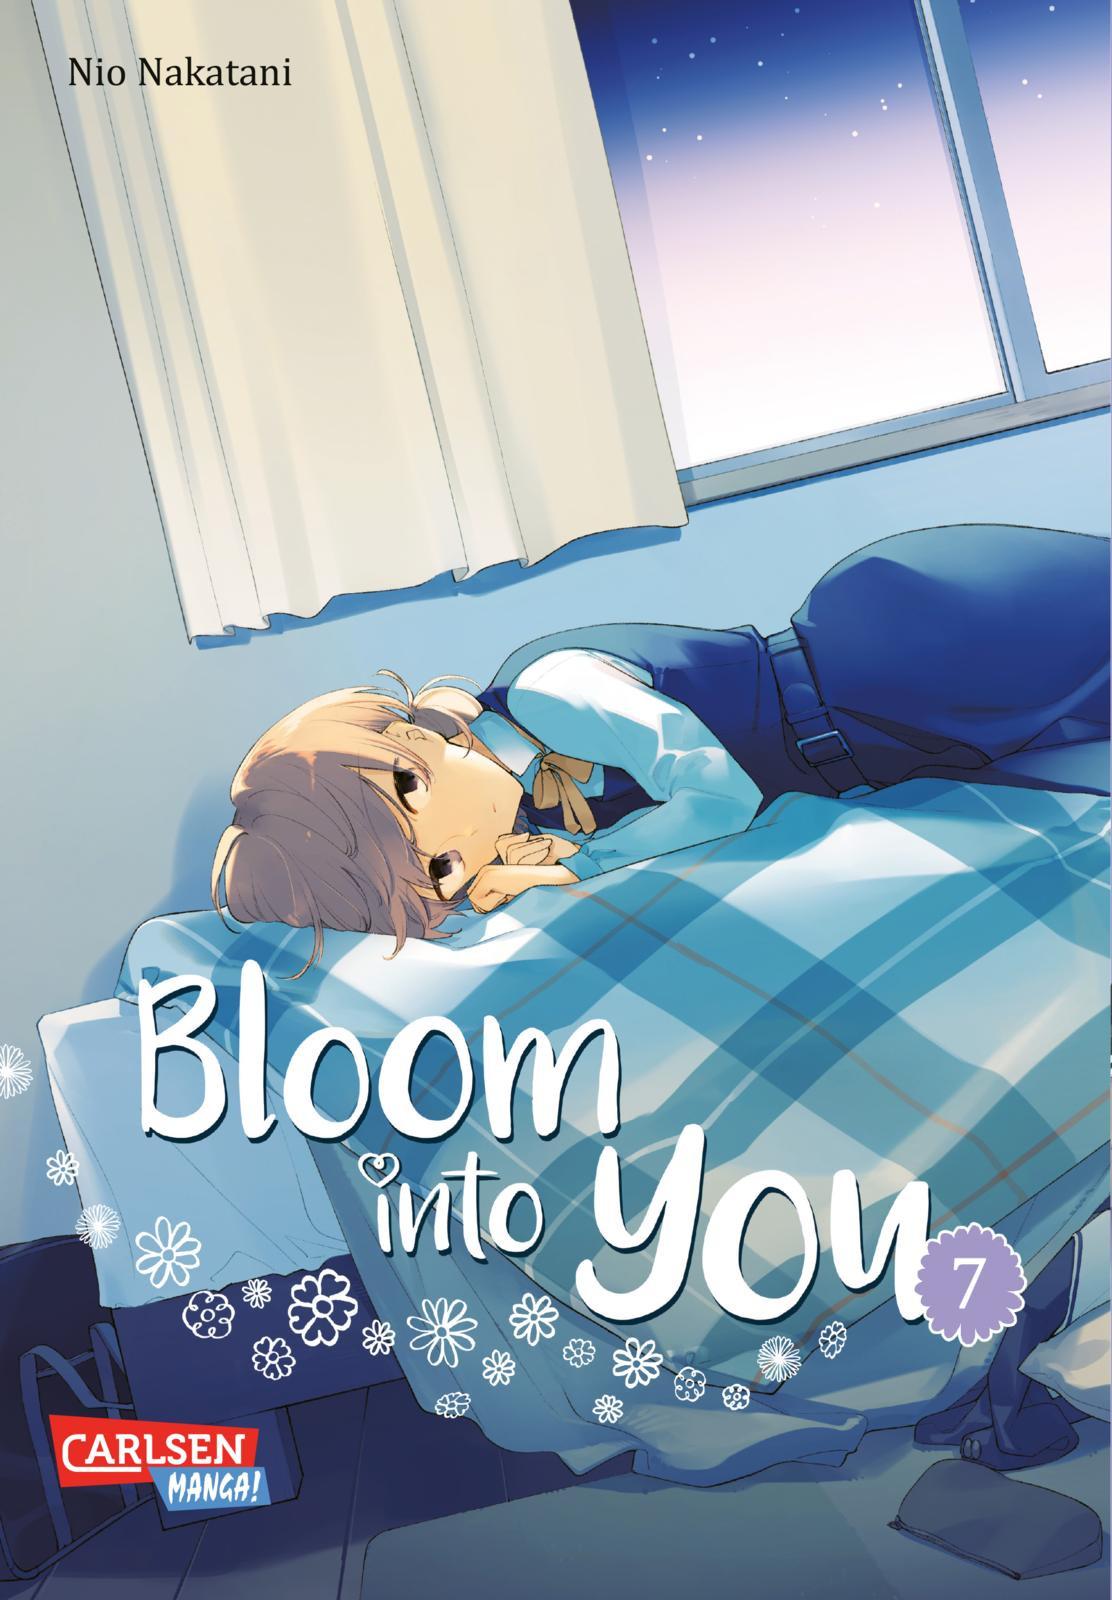 Bloom into you 7 Manga